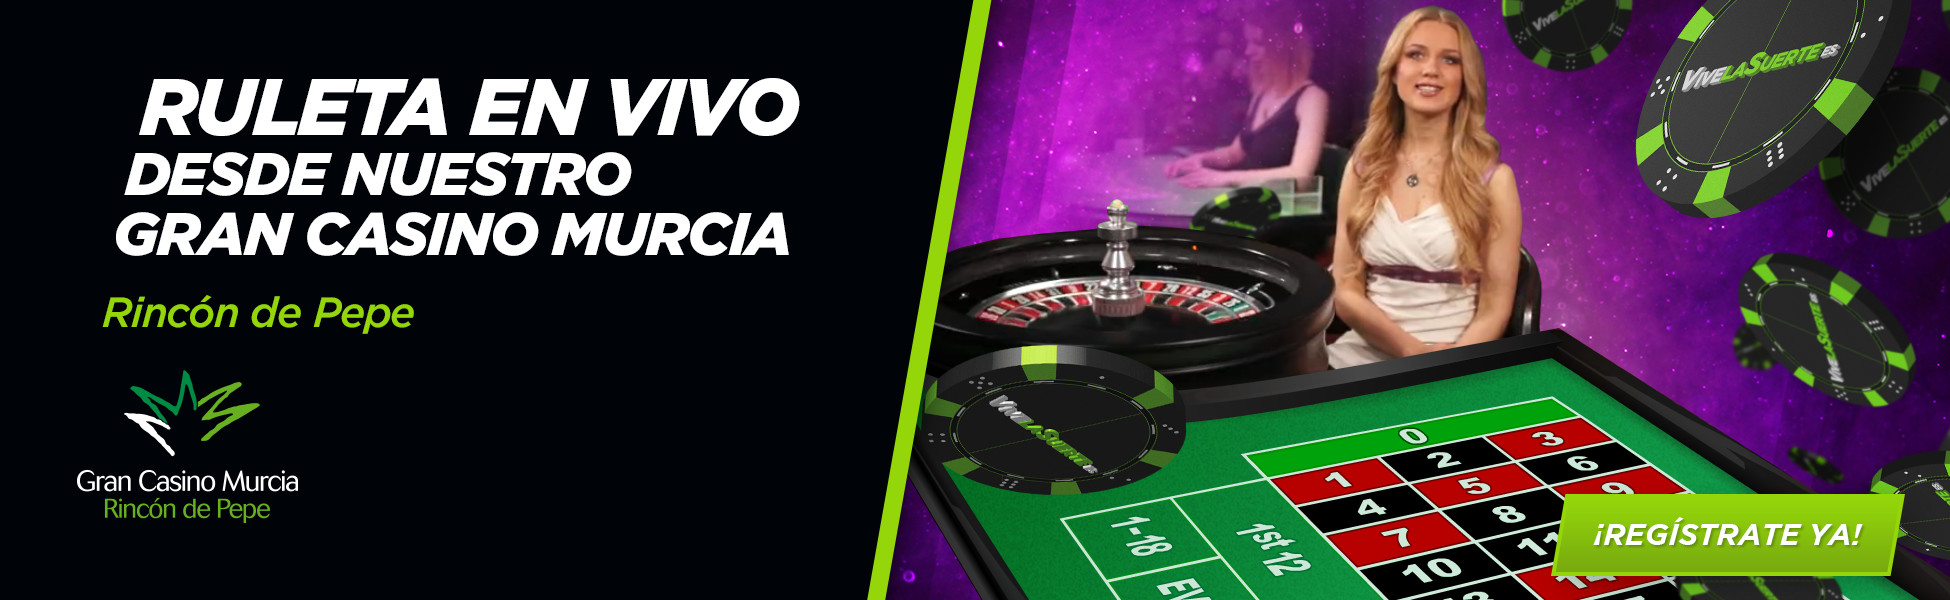 Ruleta online informe sobre 888 casino-461751